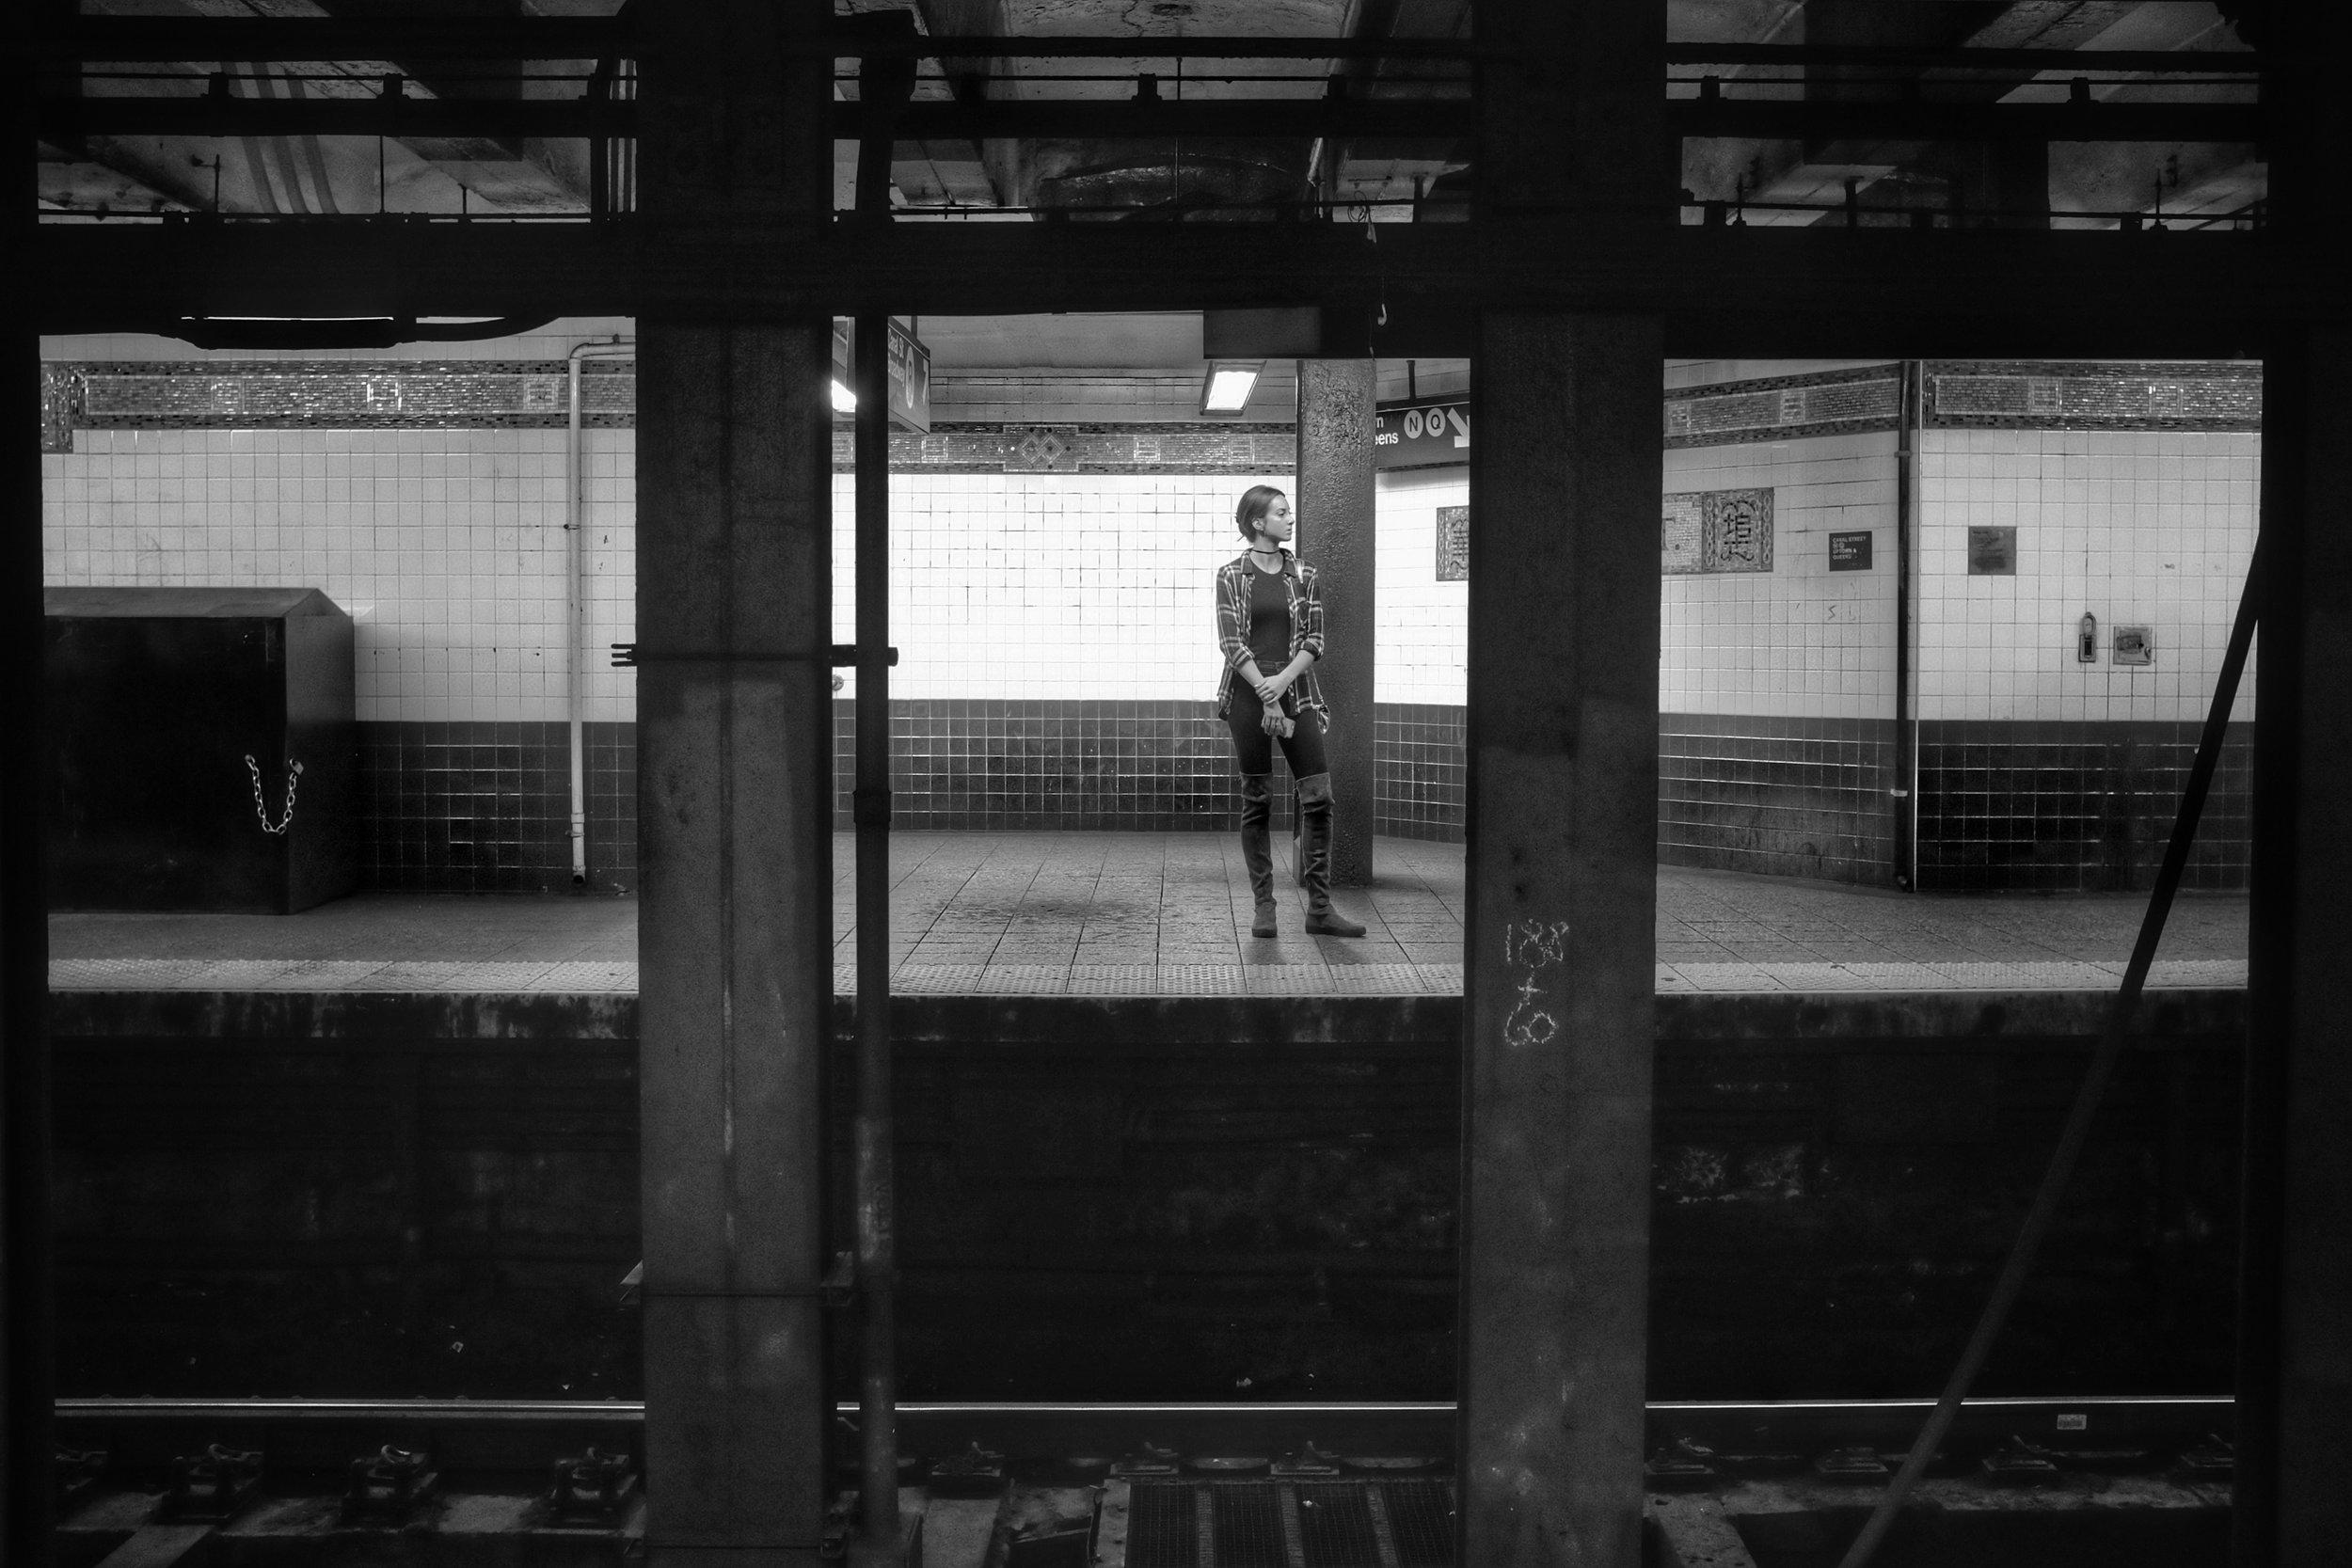 Canal Street NRQ Station. Chinatown. New York City. 2016.